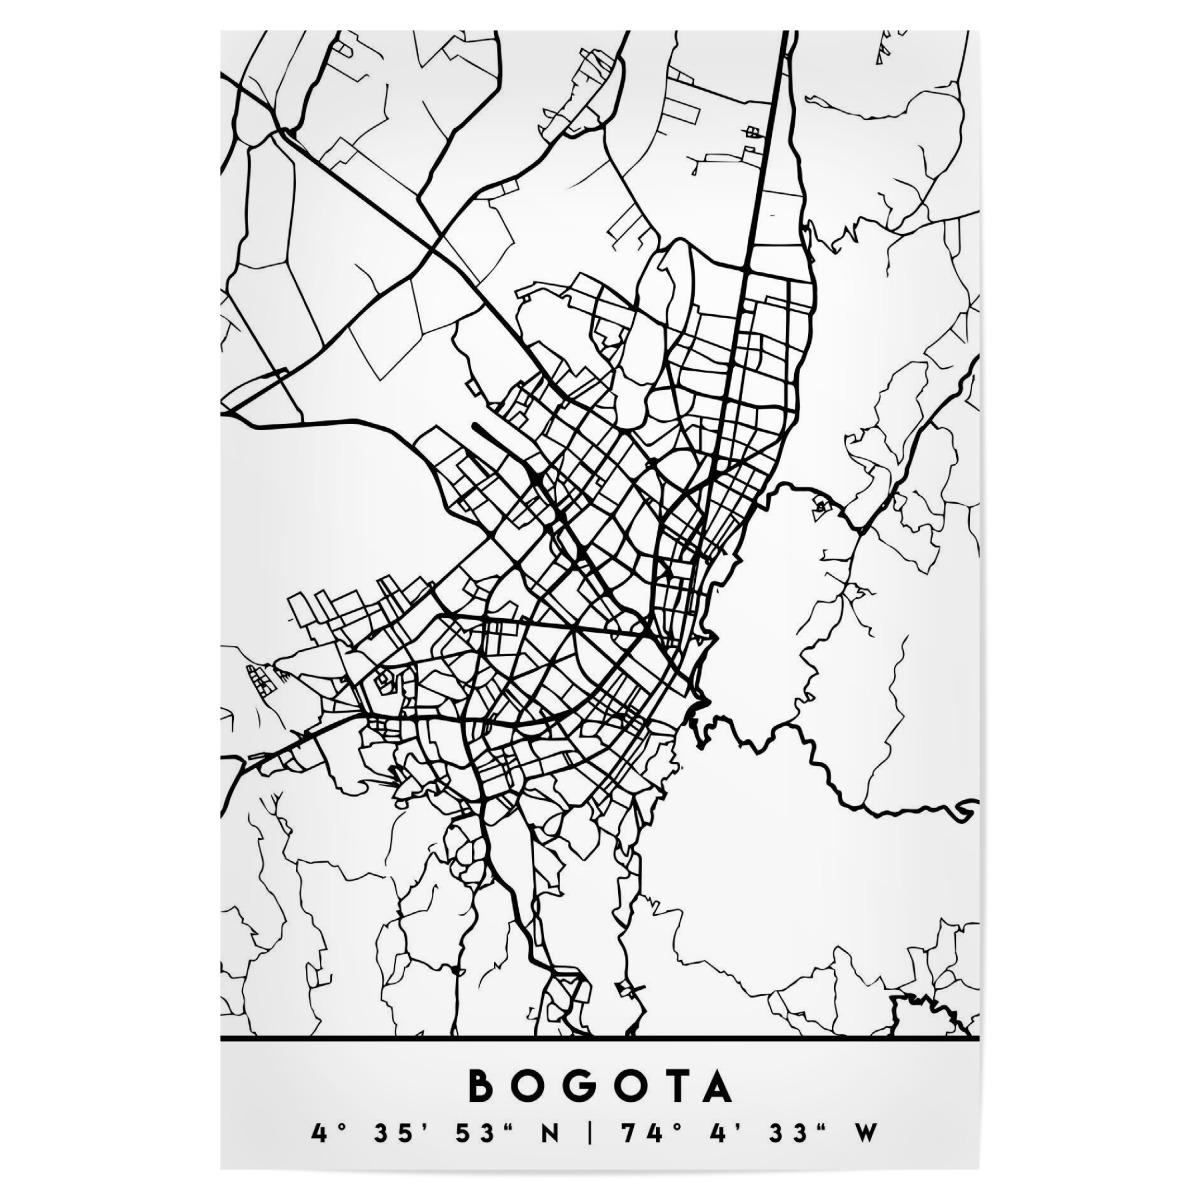 BOGOTA COLOMBIA BLACK CITY MAP als Poster bei artboxONE kaufen